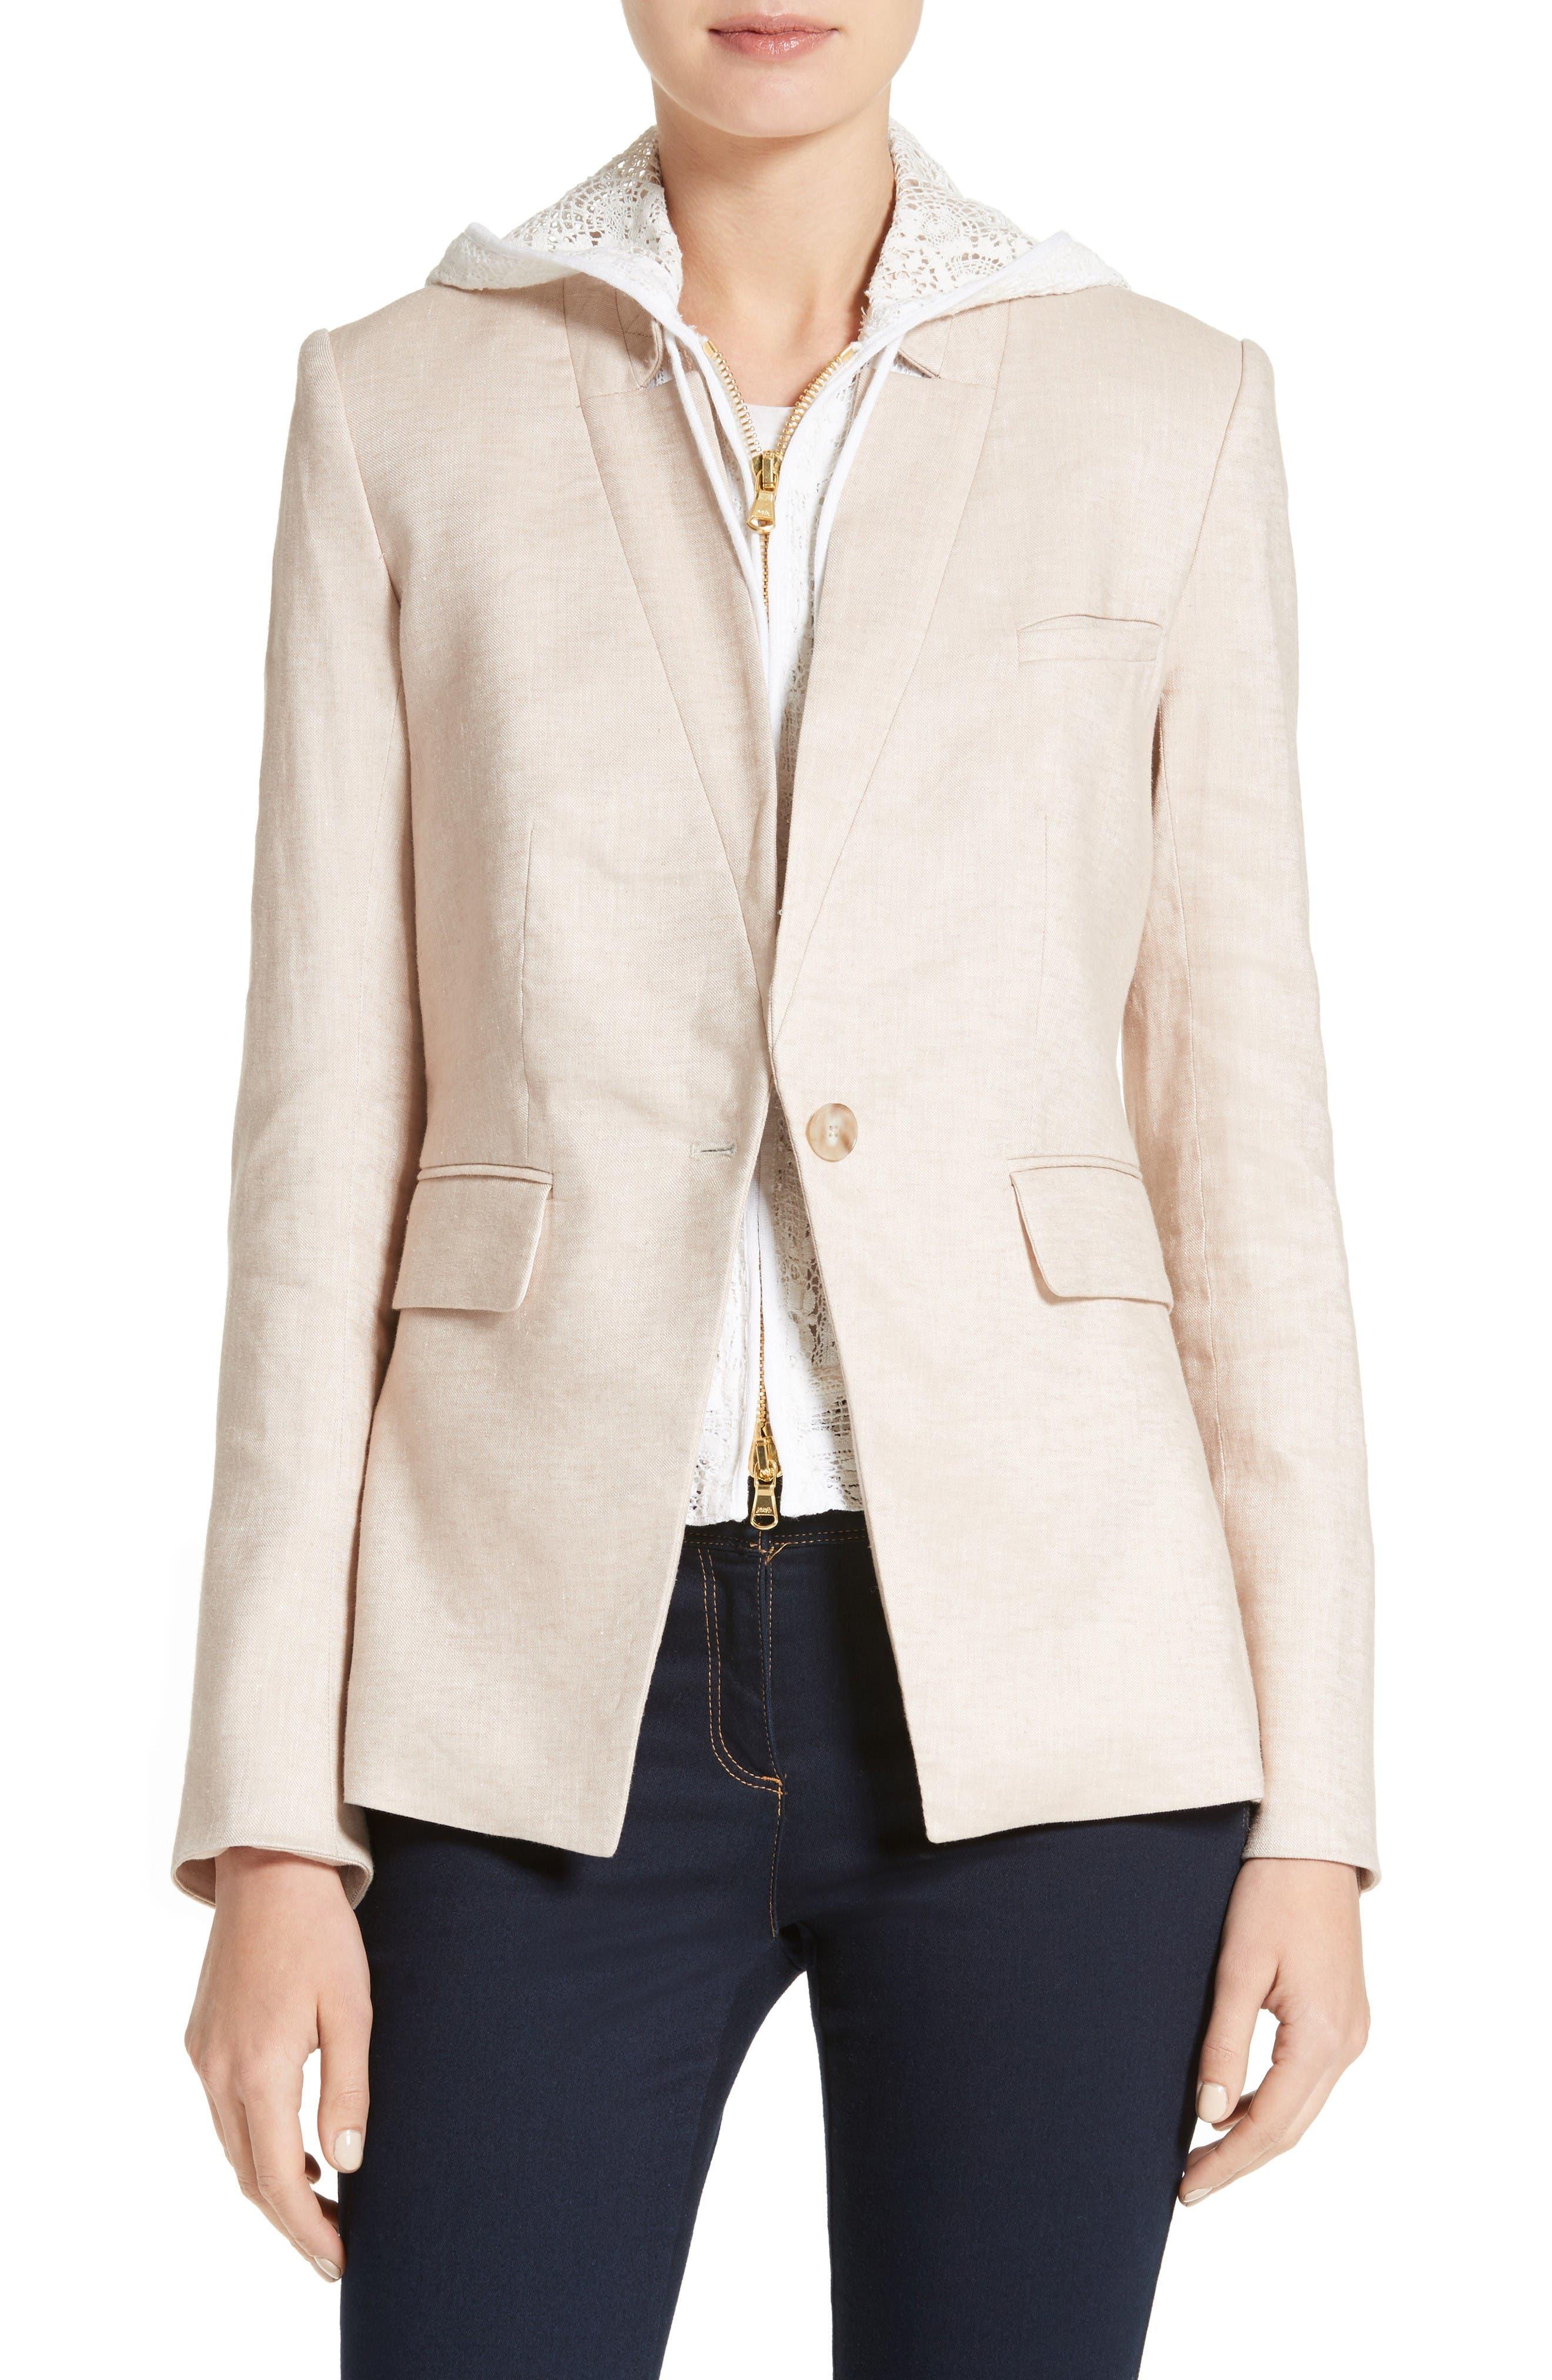 Veronica Beard Turn-Up Collar Jacket